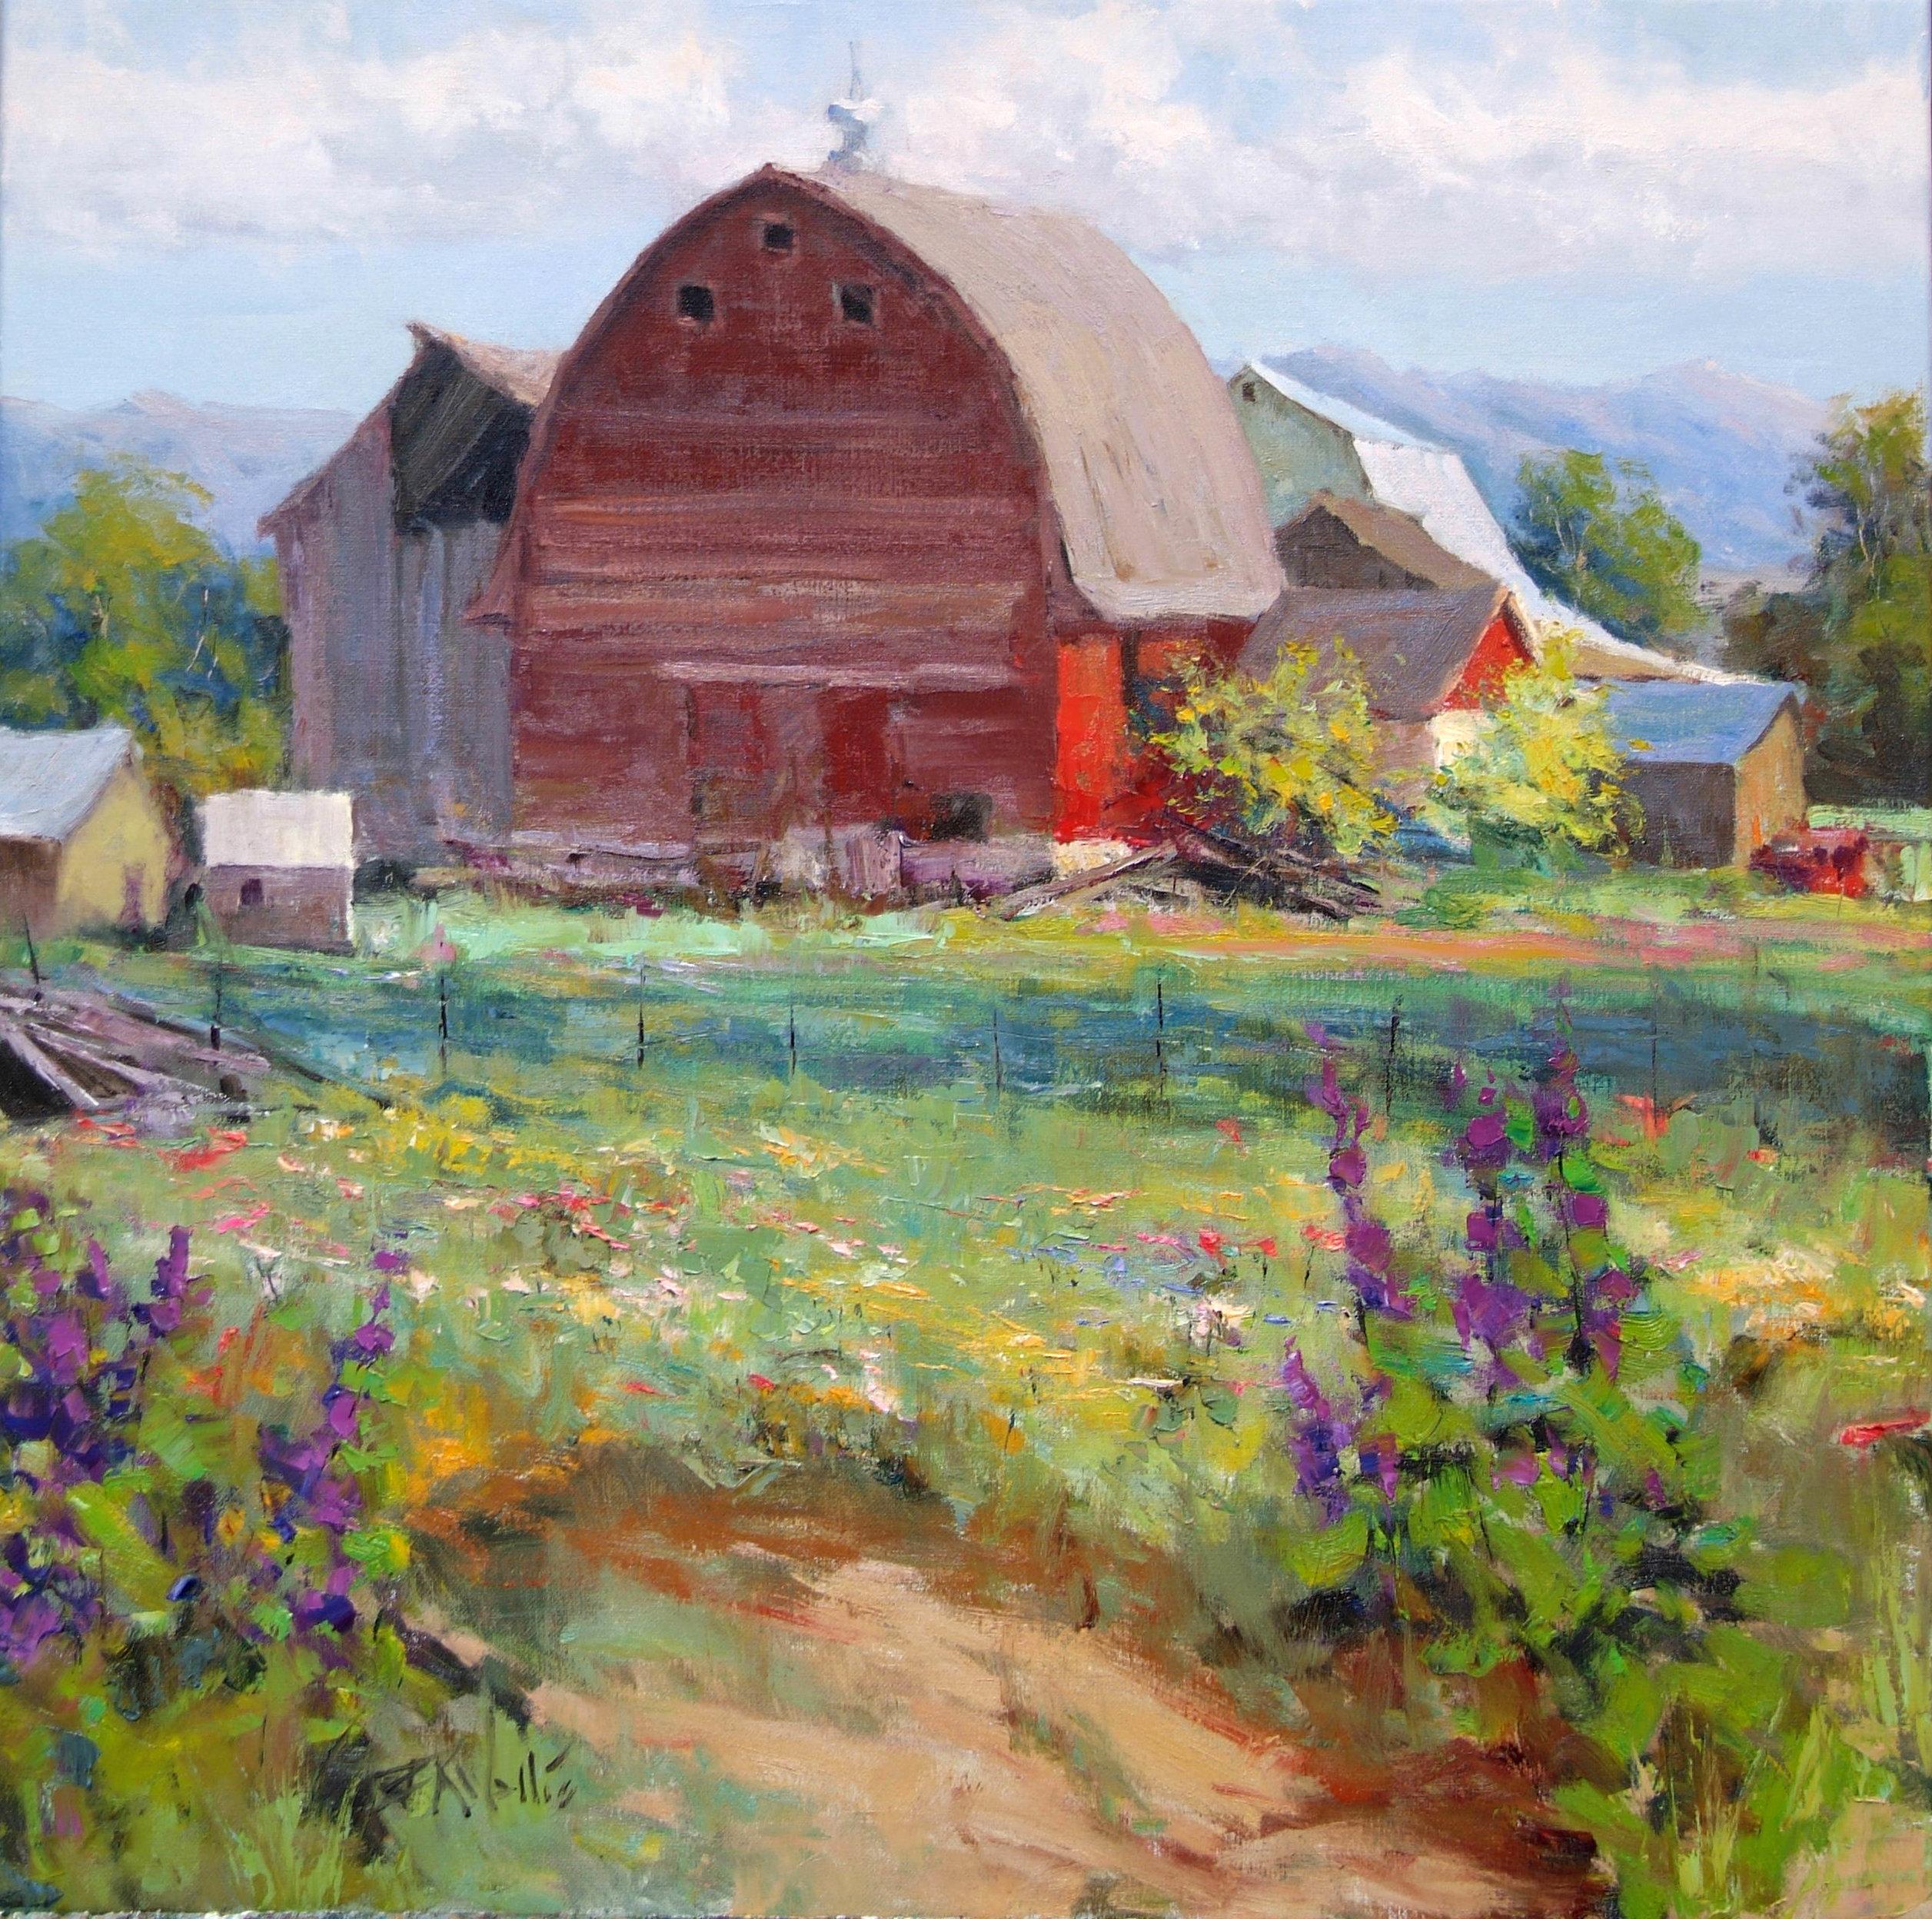 Eric Wallis - Old Red Barn